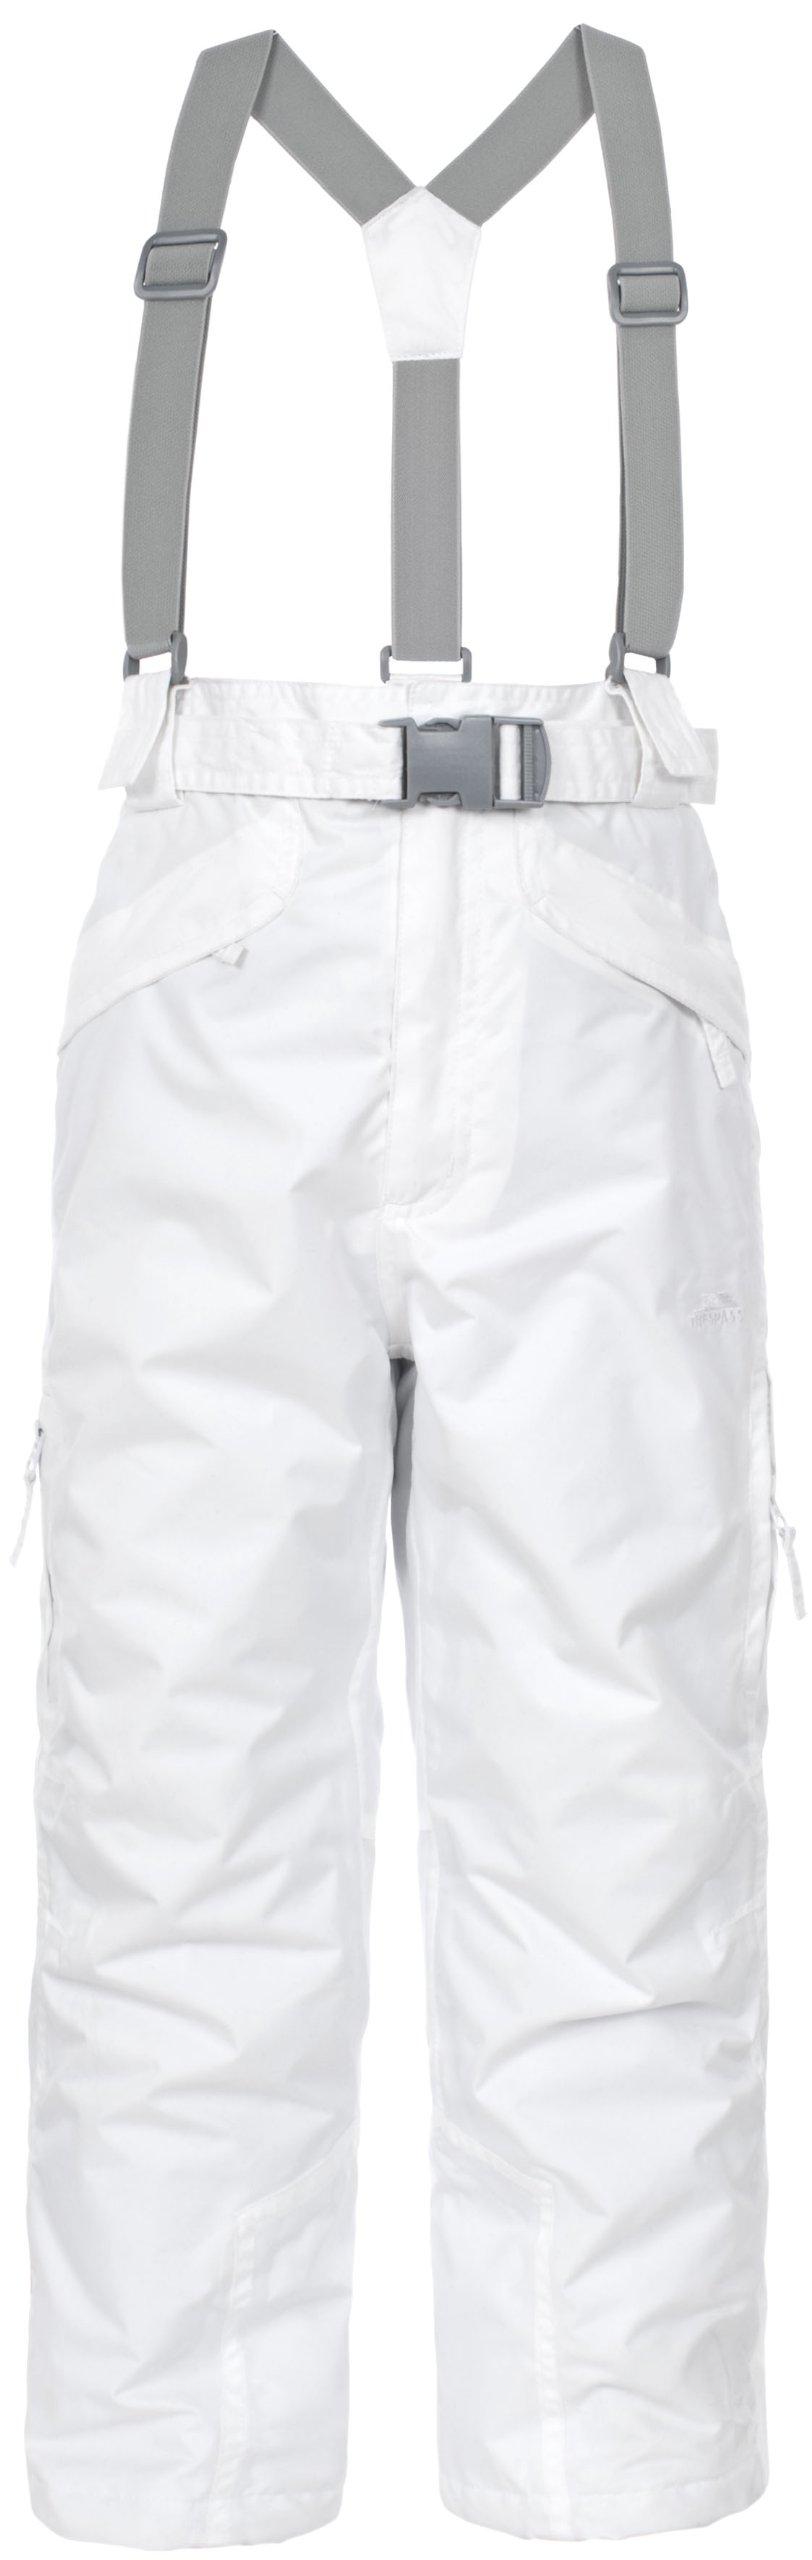 Trespass Kids Marvelous Unisex Snow Pant, White, 9/10